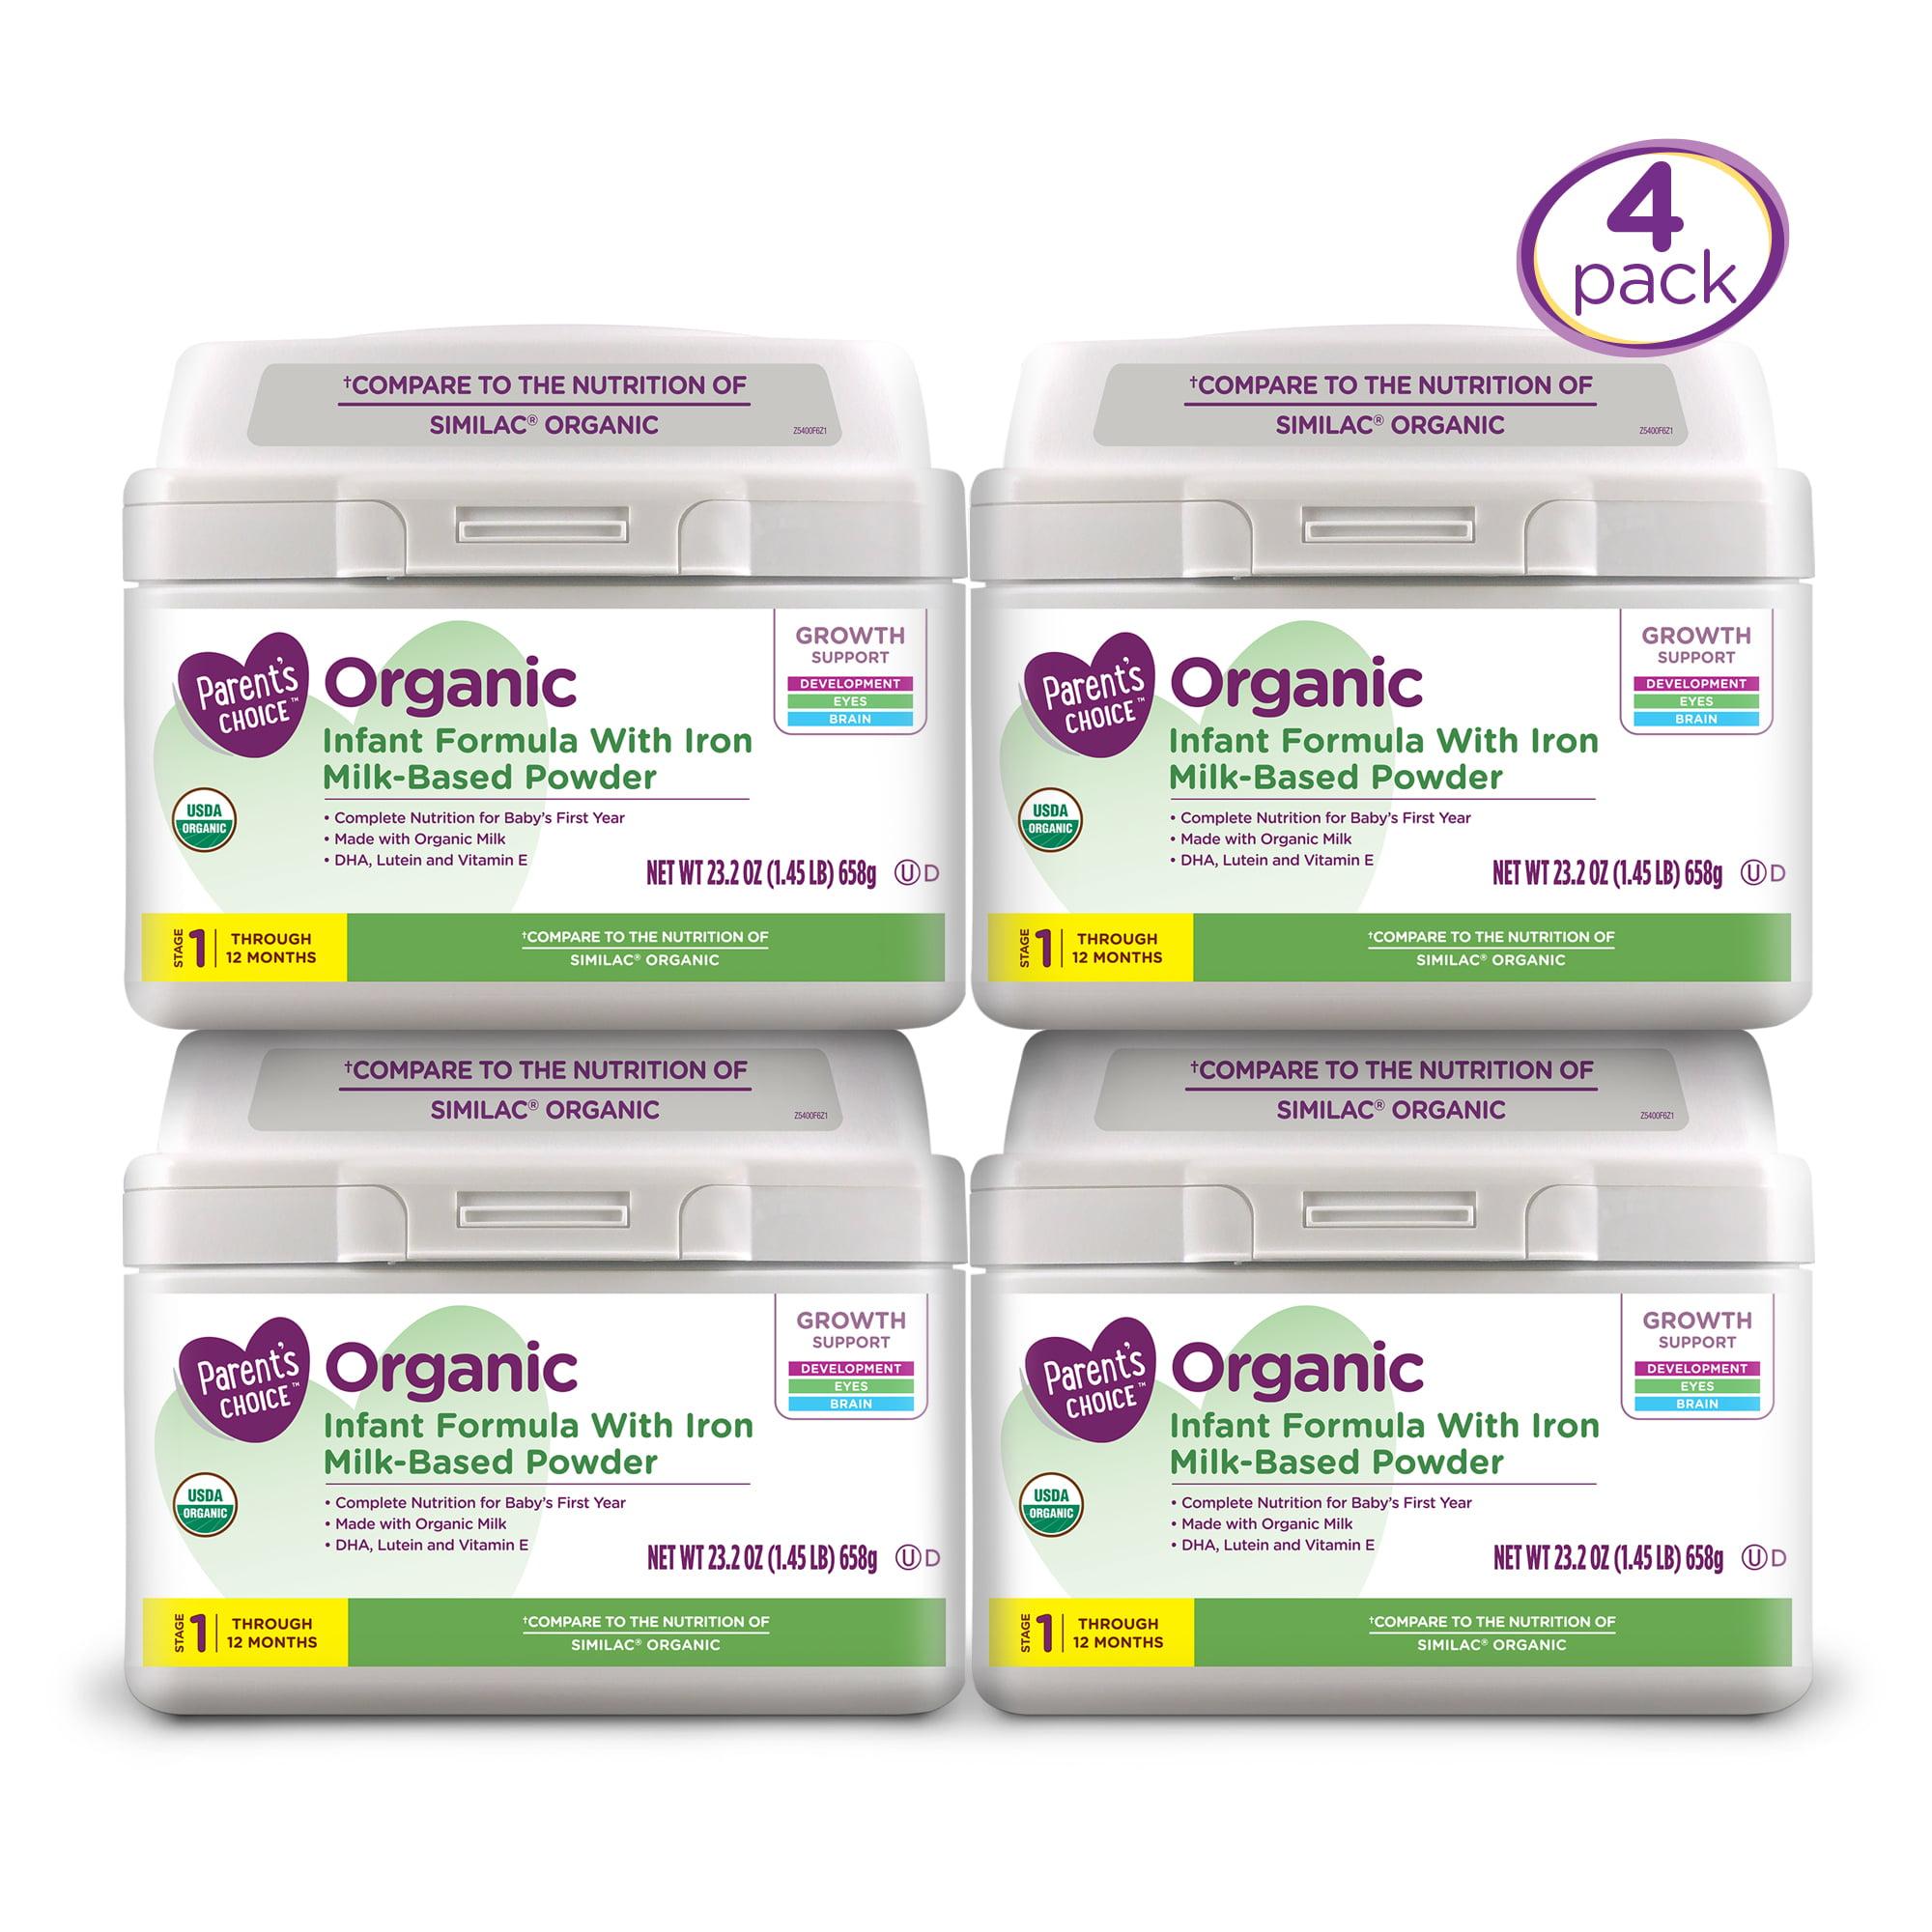 Parent's Choice Organic Milk-Based Formula (Pack of 4) 23.2 oz